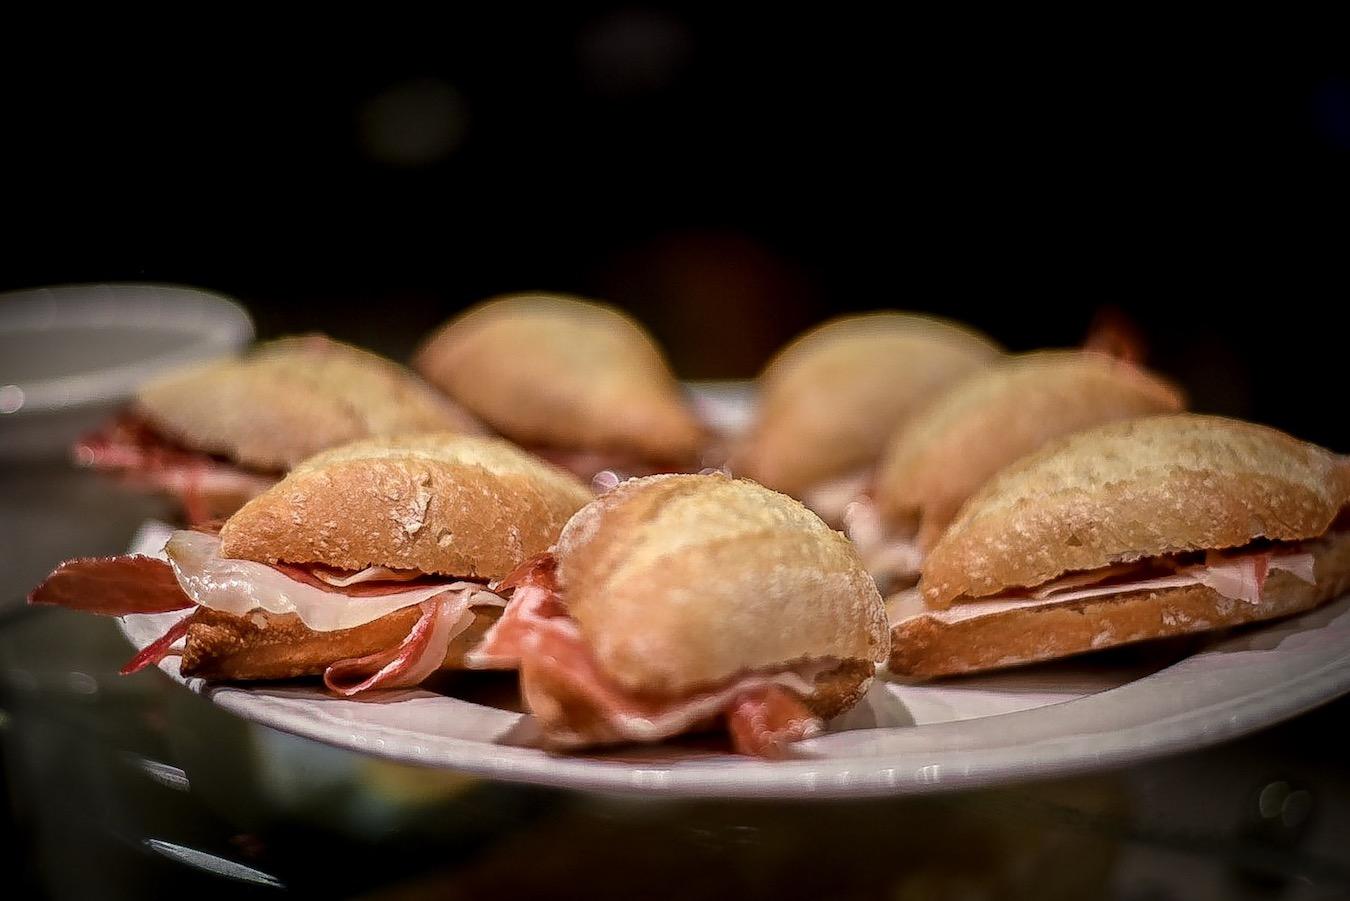 Jamon sandwiches in Santander, Spain.